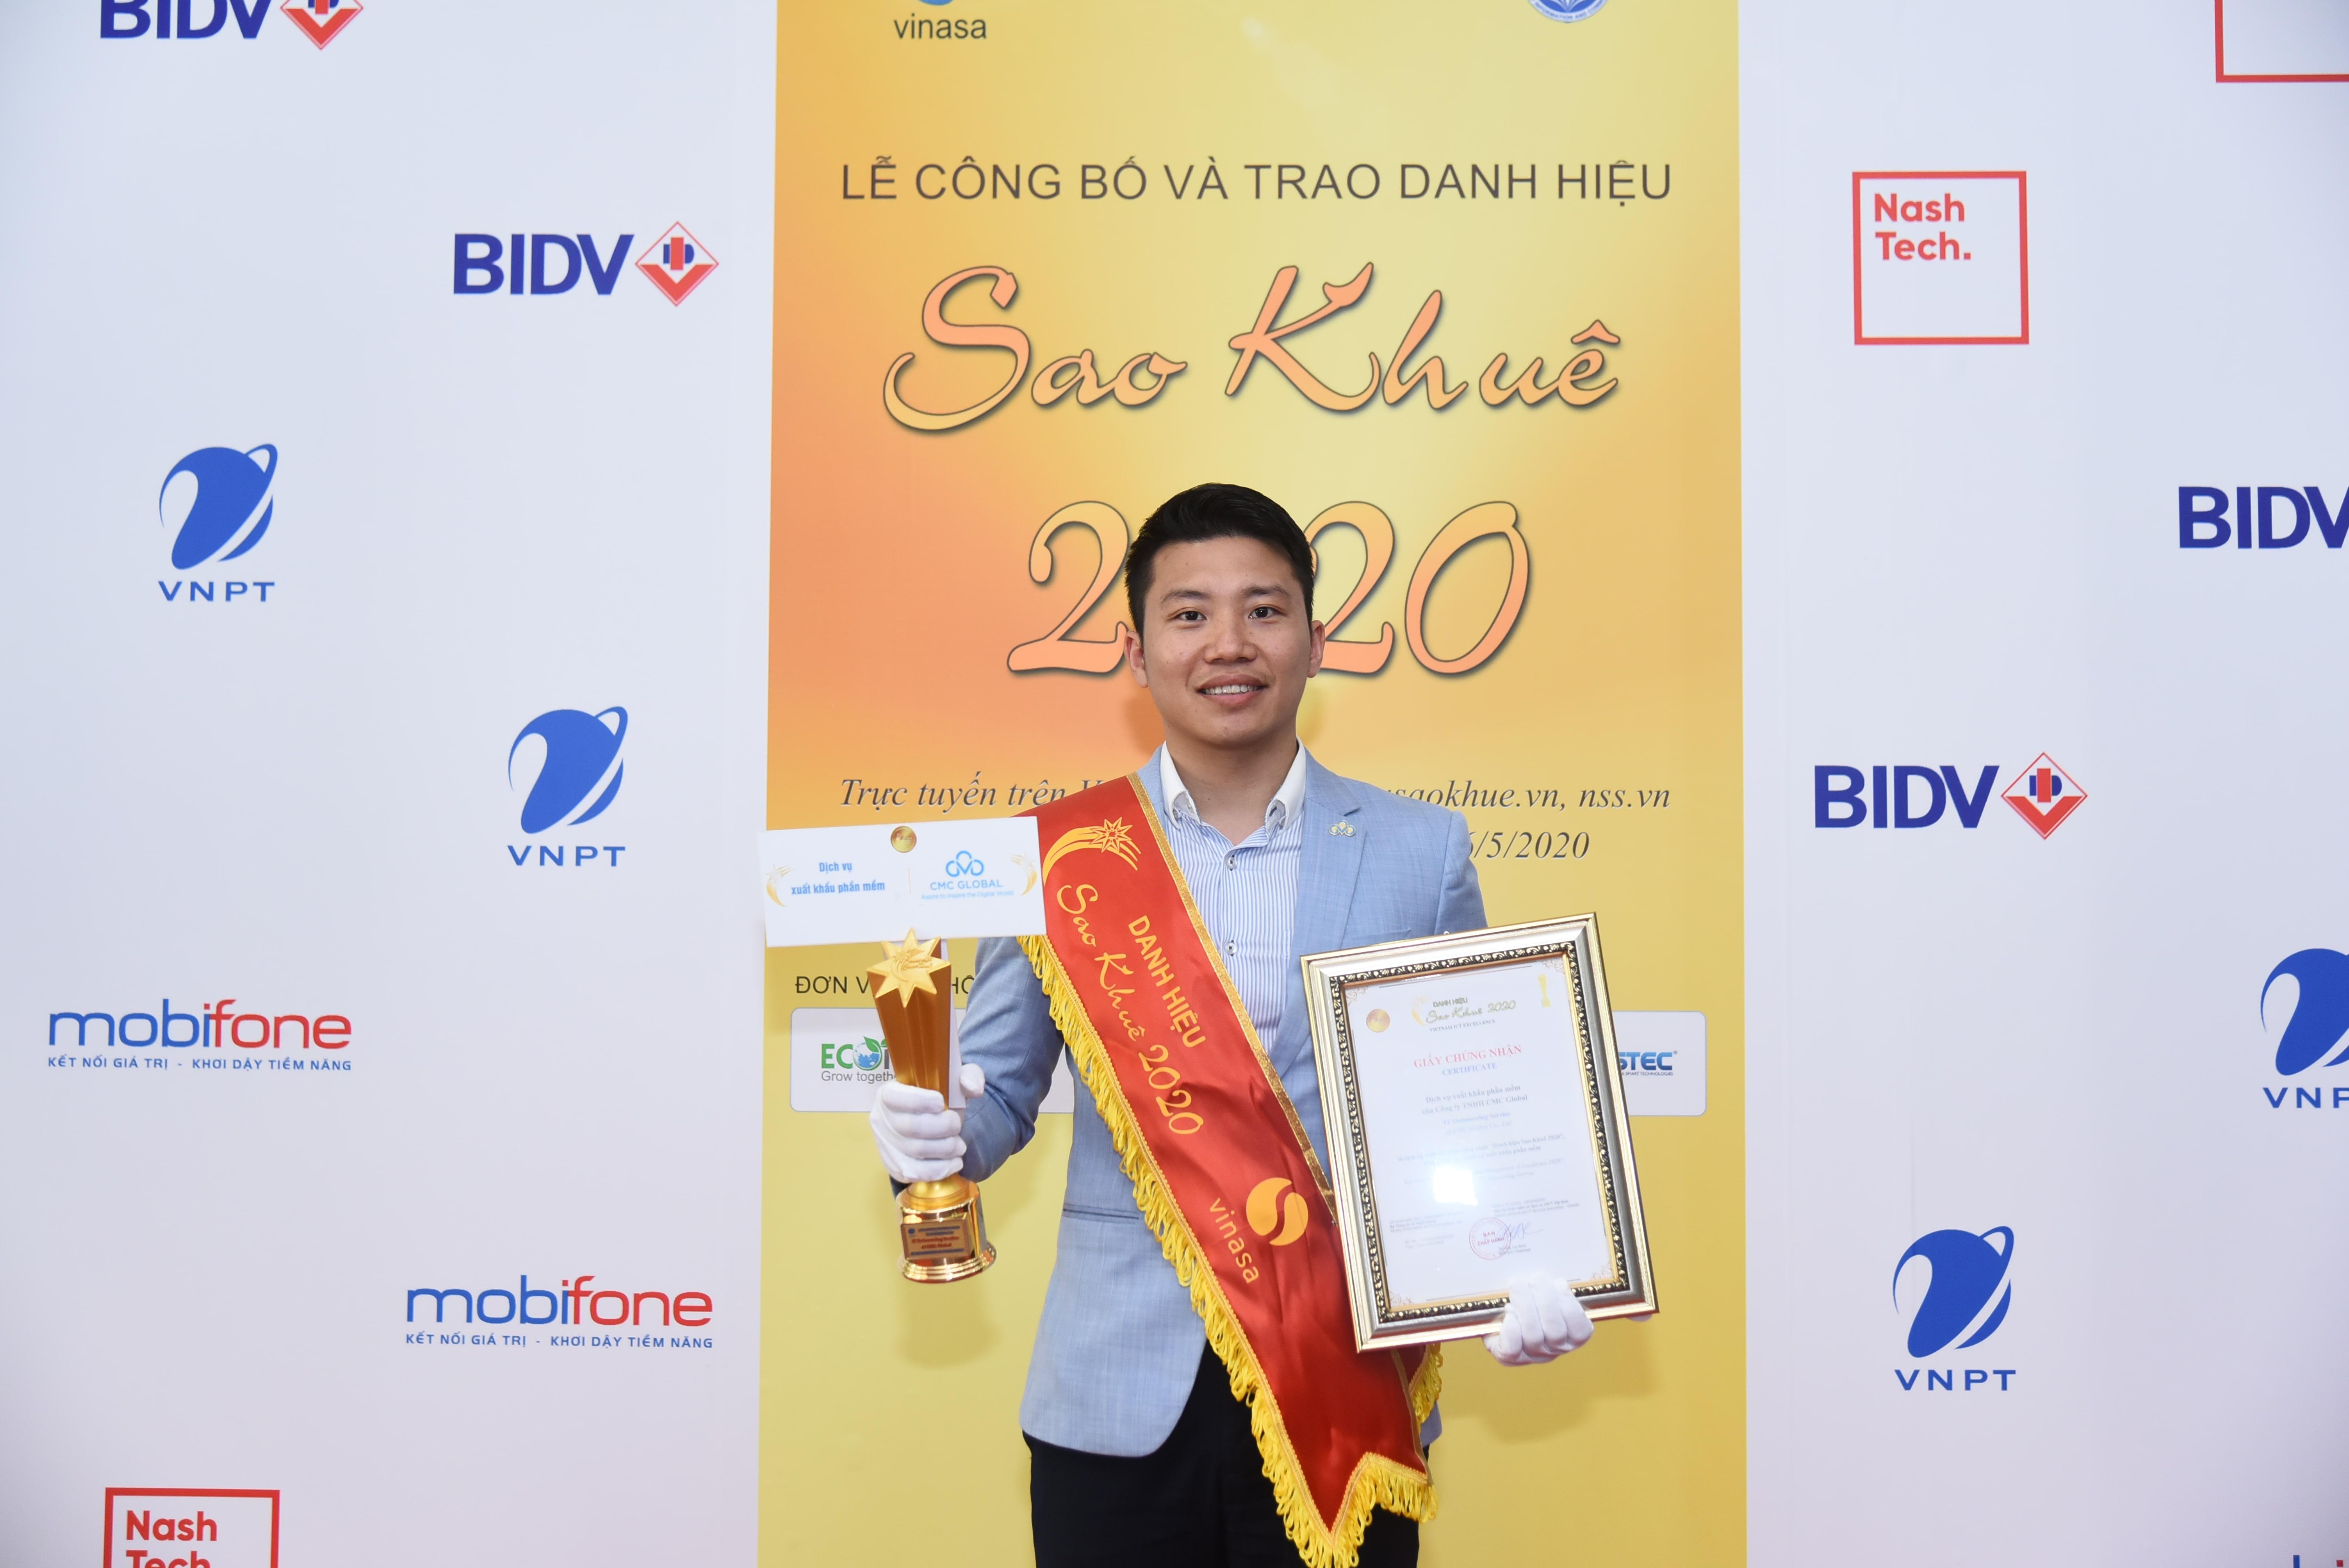 「Sao Khue Award 2020」を受賞!